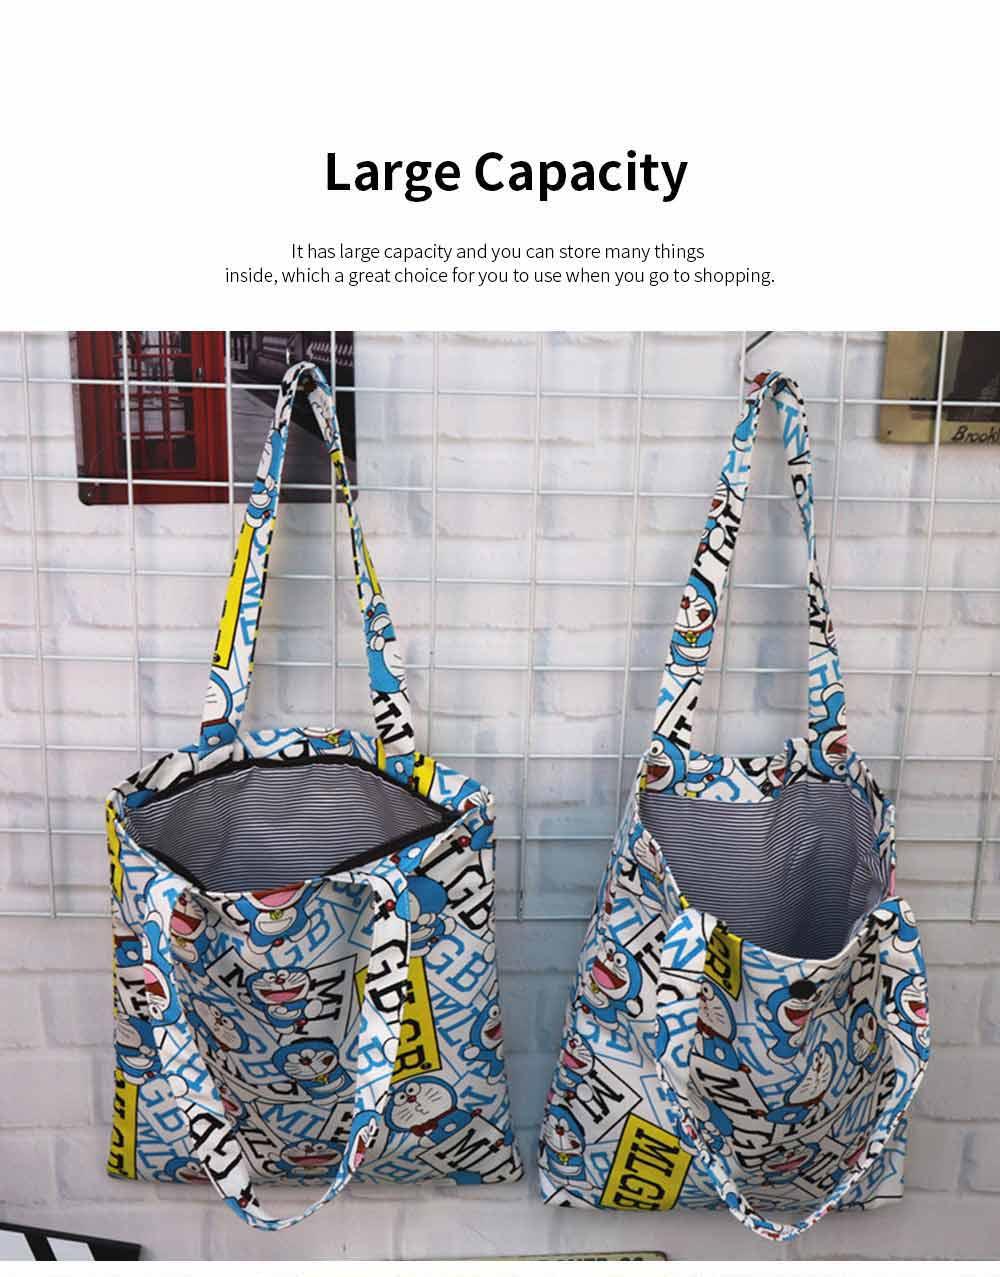 Canvas Cartoon Hand Bag Shoulder Bag, Environmental Protection Shopping Bag, Single-shoulder Bag with Lovely Cartoon Image 4